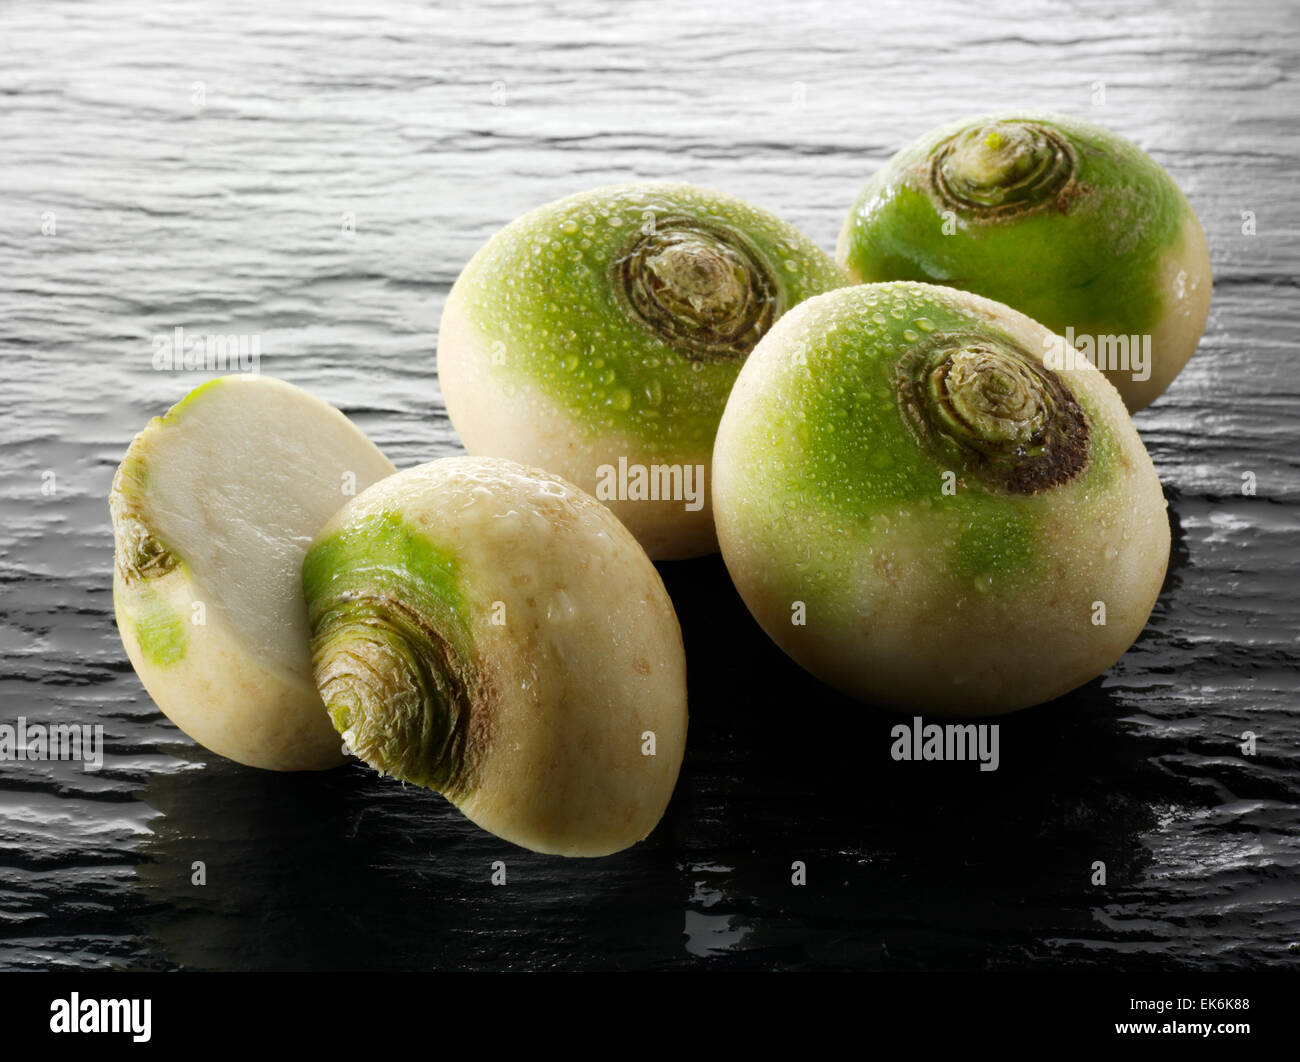 Fresh whole turnip or white turnip (Brassica rapa ) - Stock Image